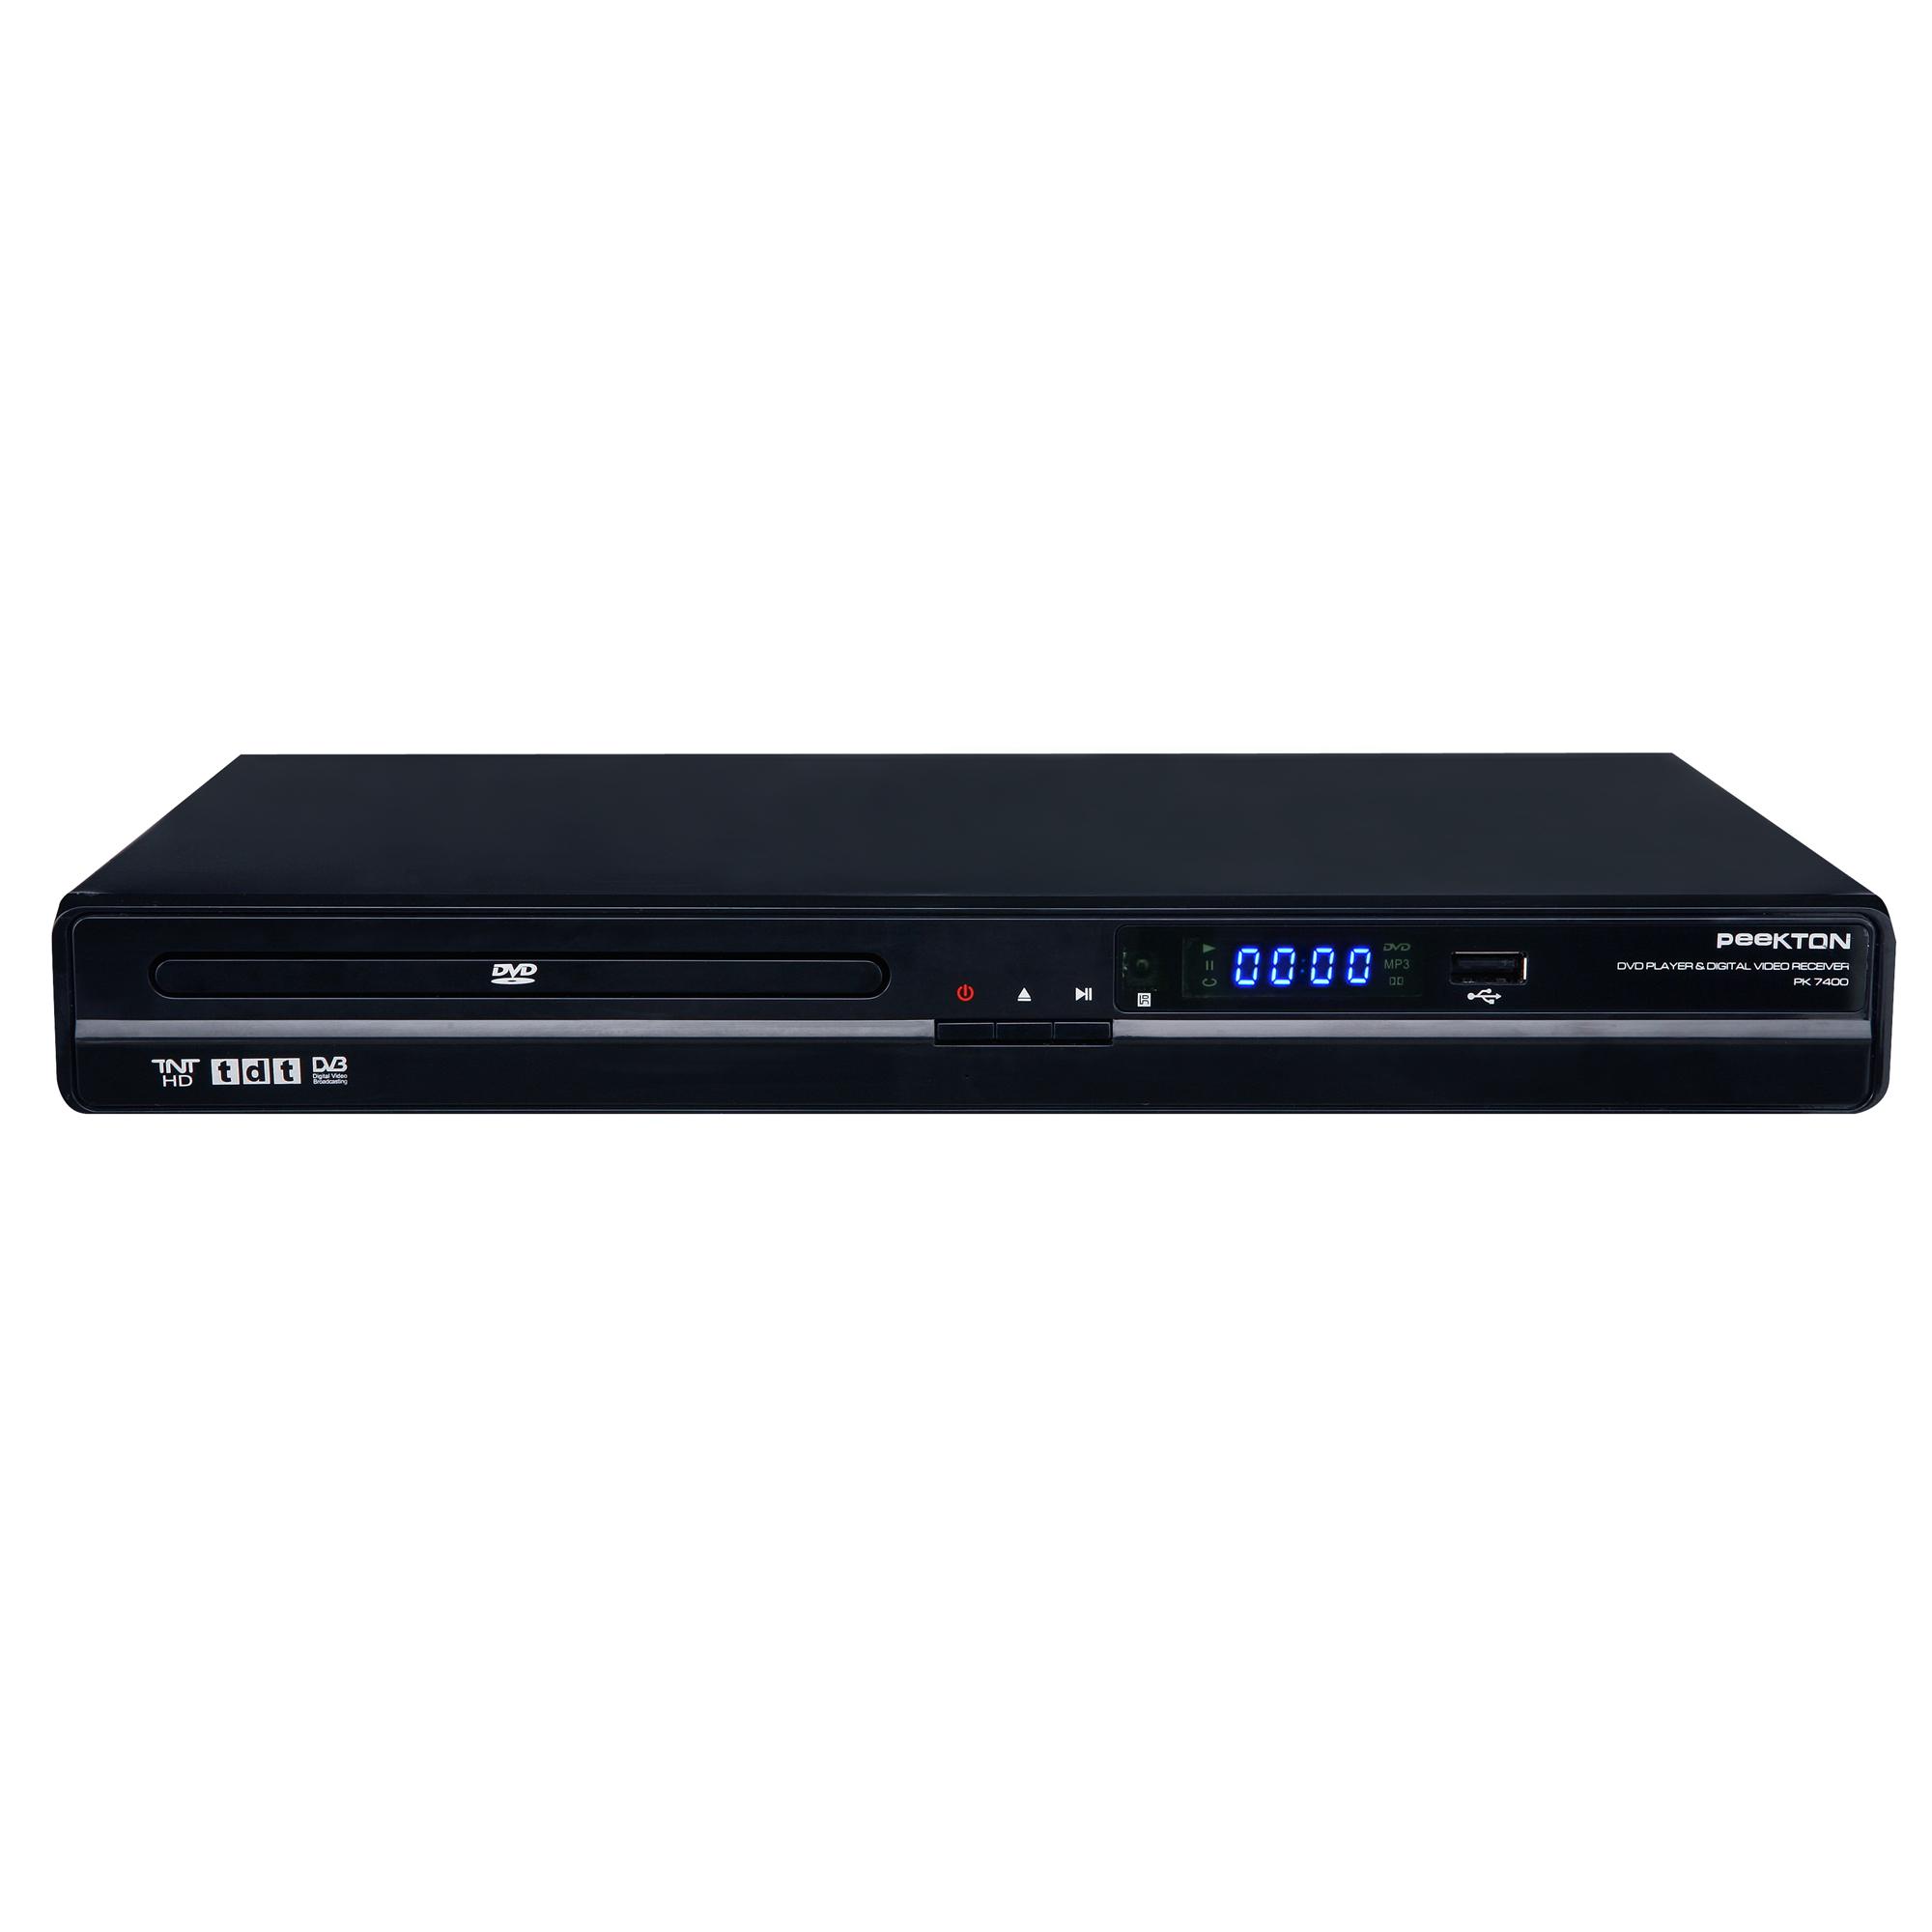 Peekton pk 7400 - Lecteur dvd de salon ...